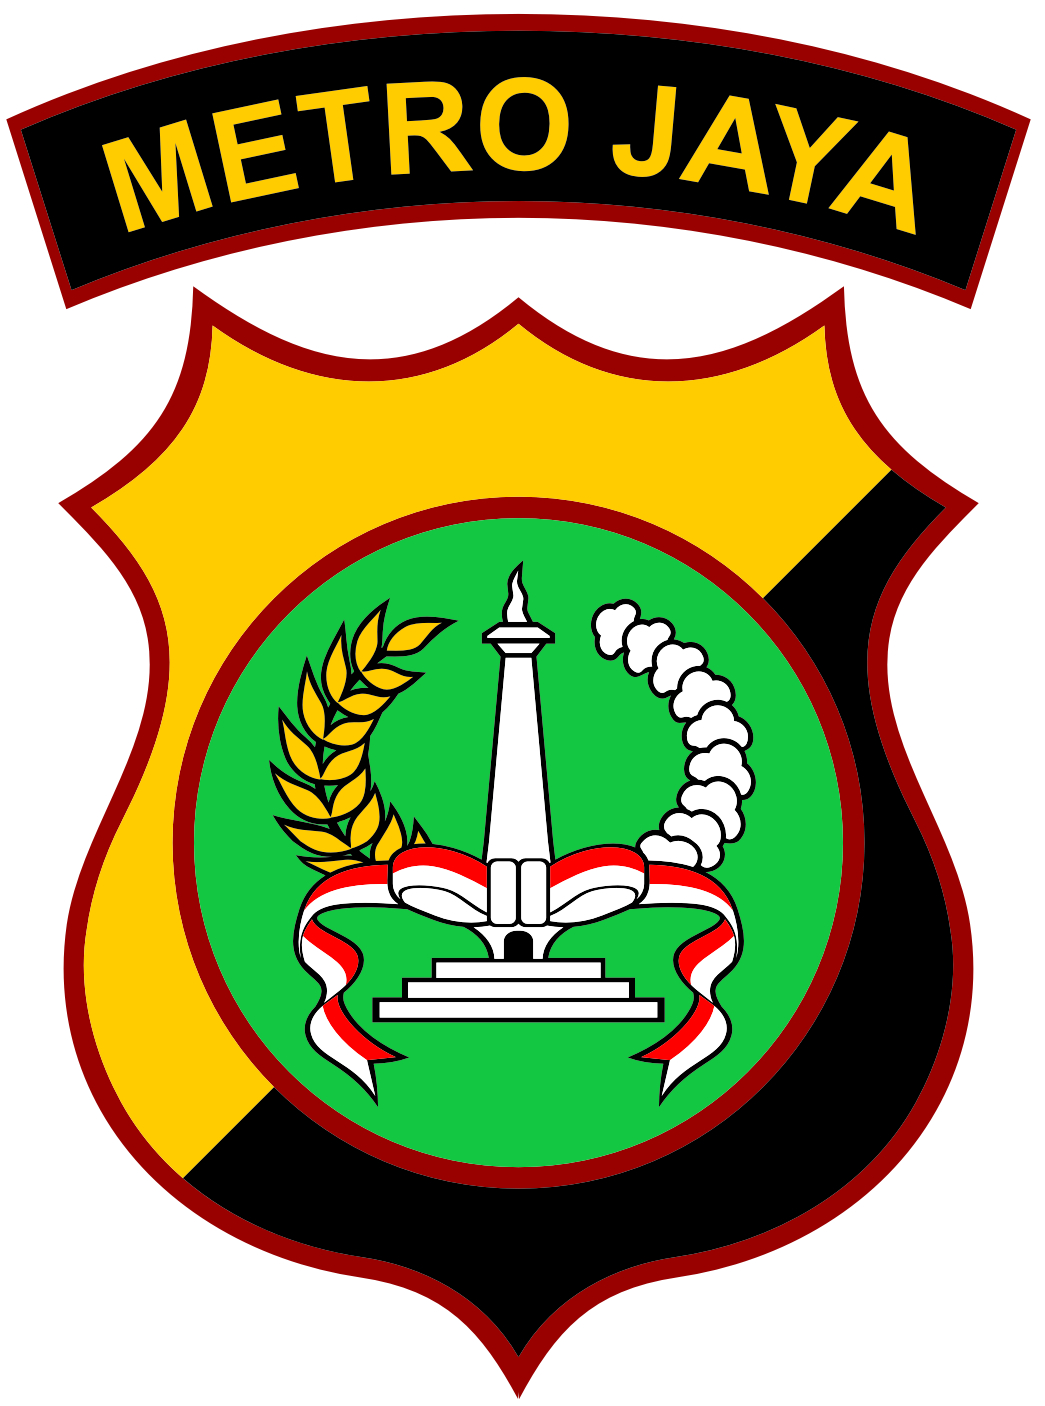 Logo Polda Metro Jaya Kumpulan Logo Lambang Indonesia